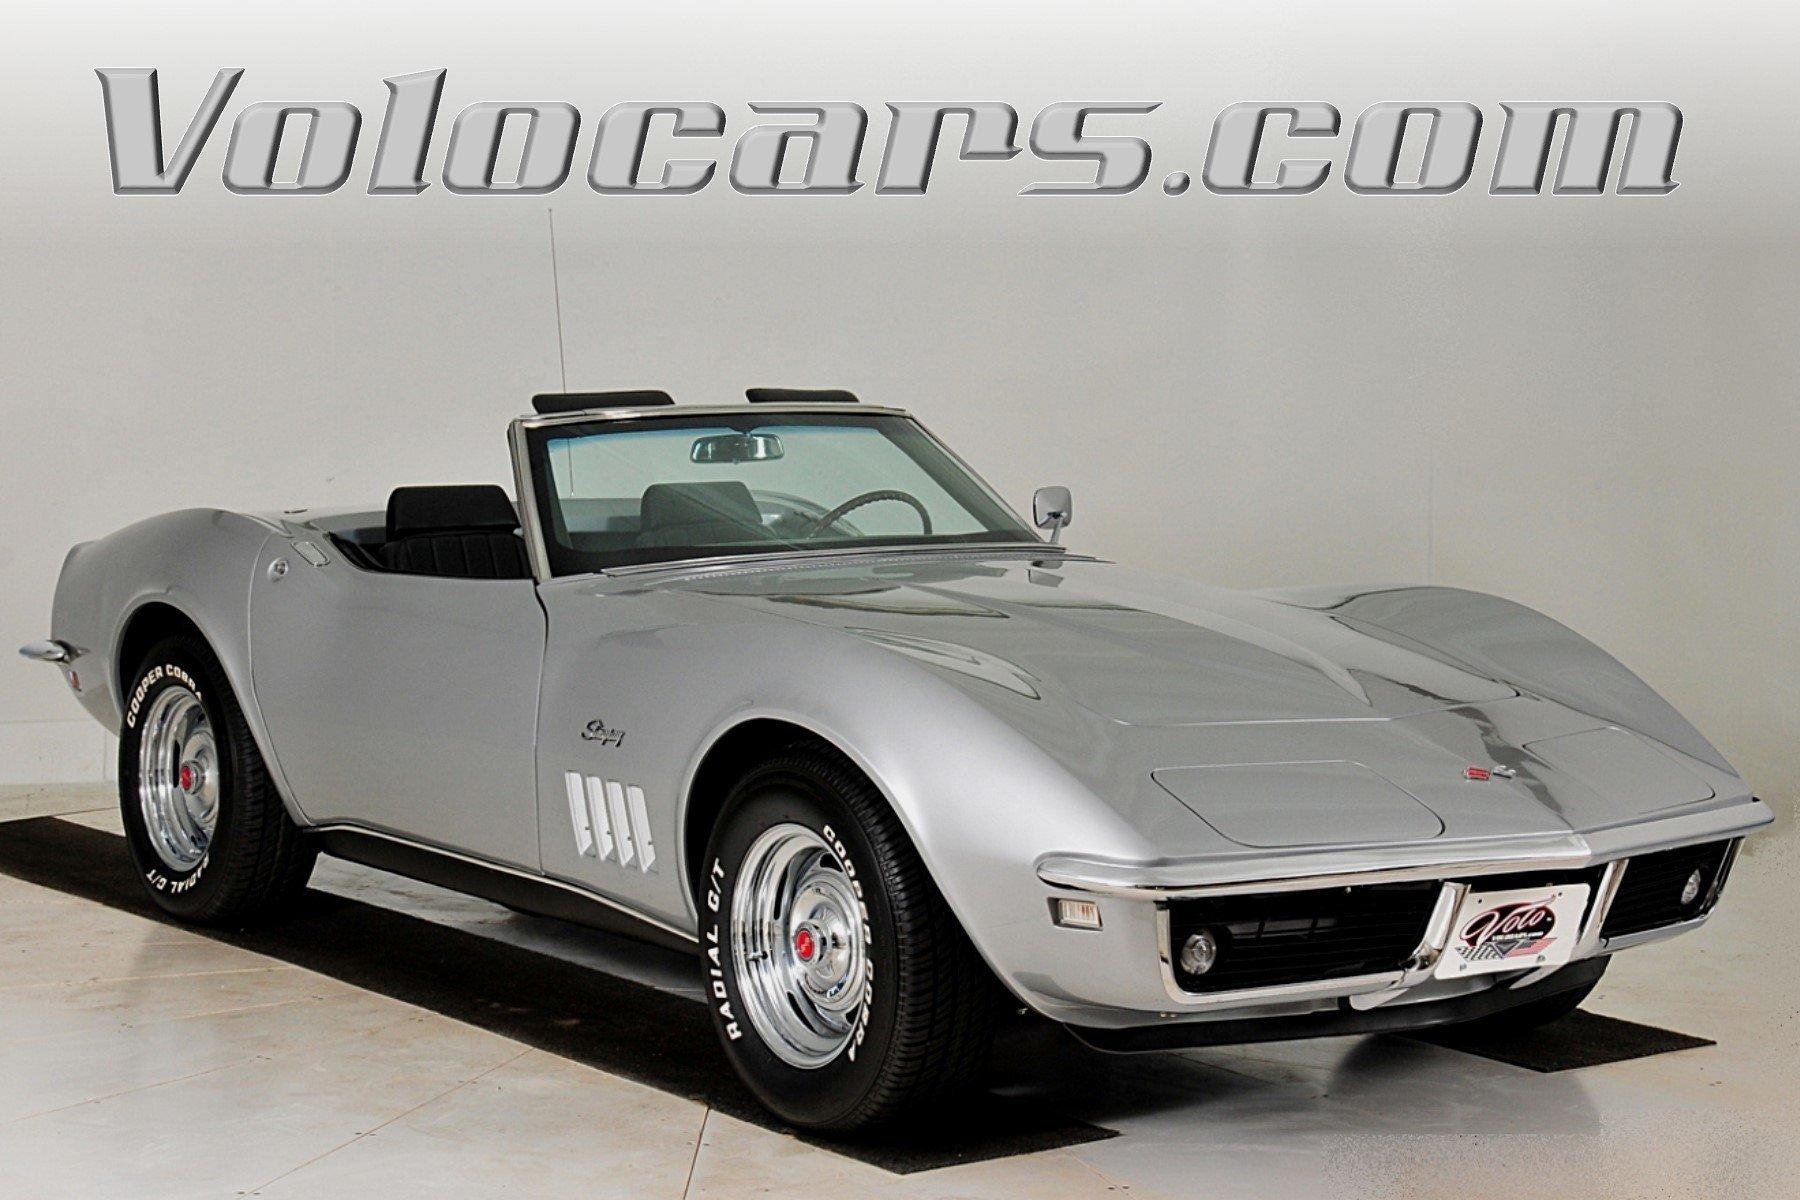 395921326f51d5 hd 1968 chevrolet corvette